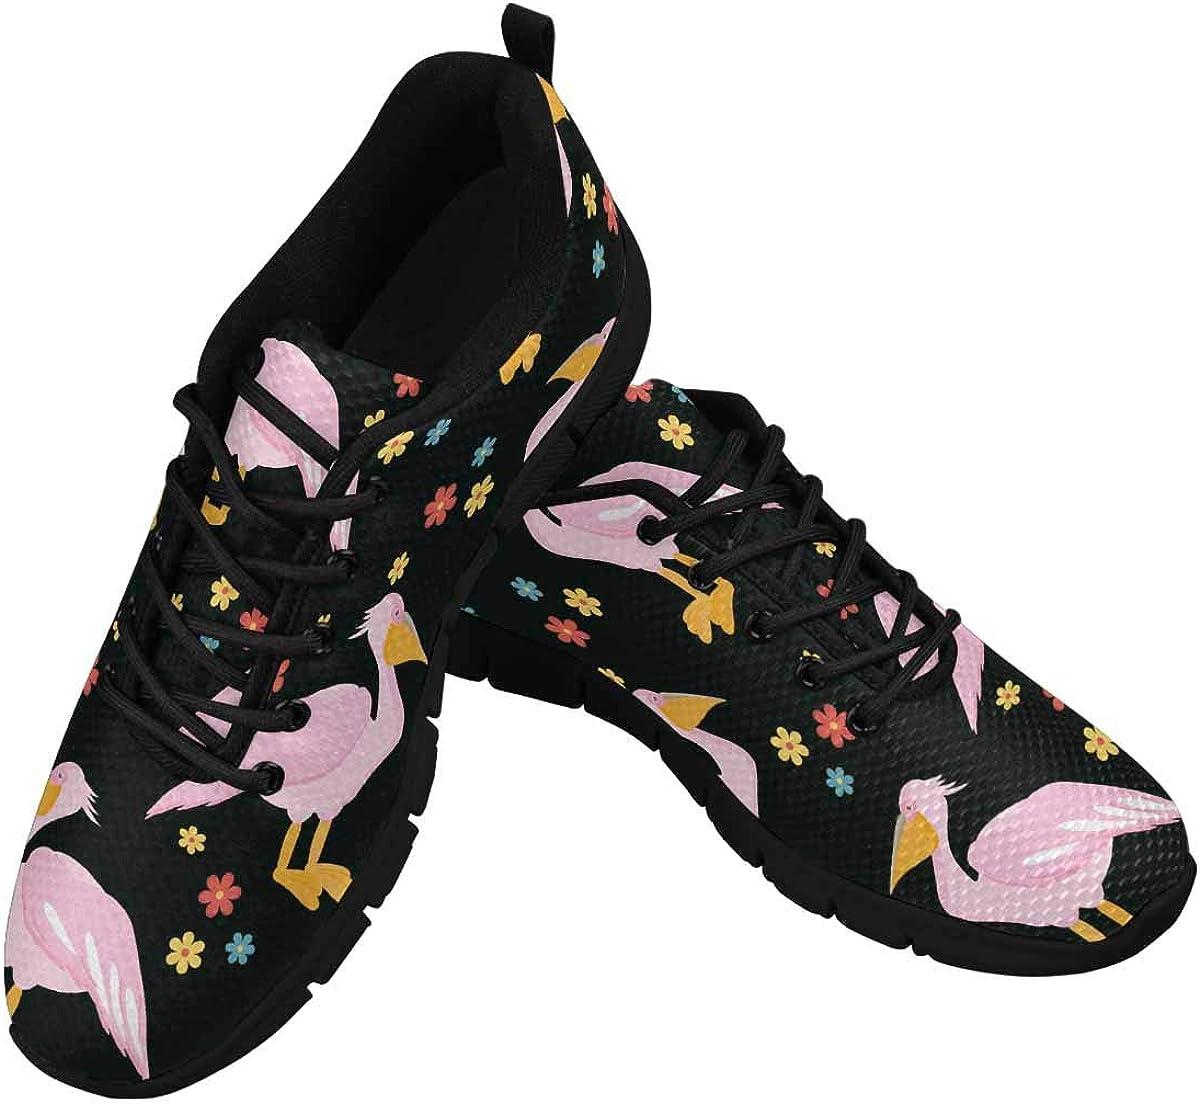 INTERESTPRINT Bird Andflowers Lightweight Mesh Breathable Sneakers for Women